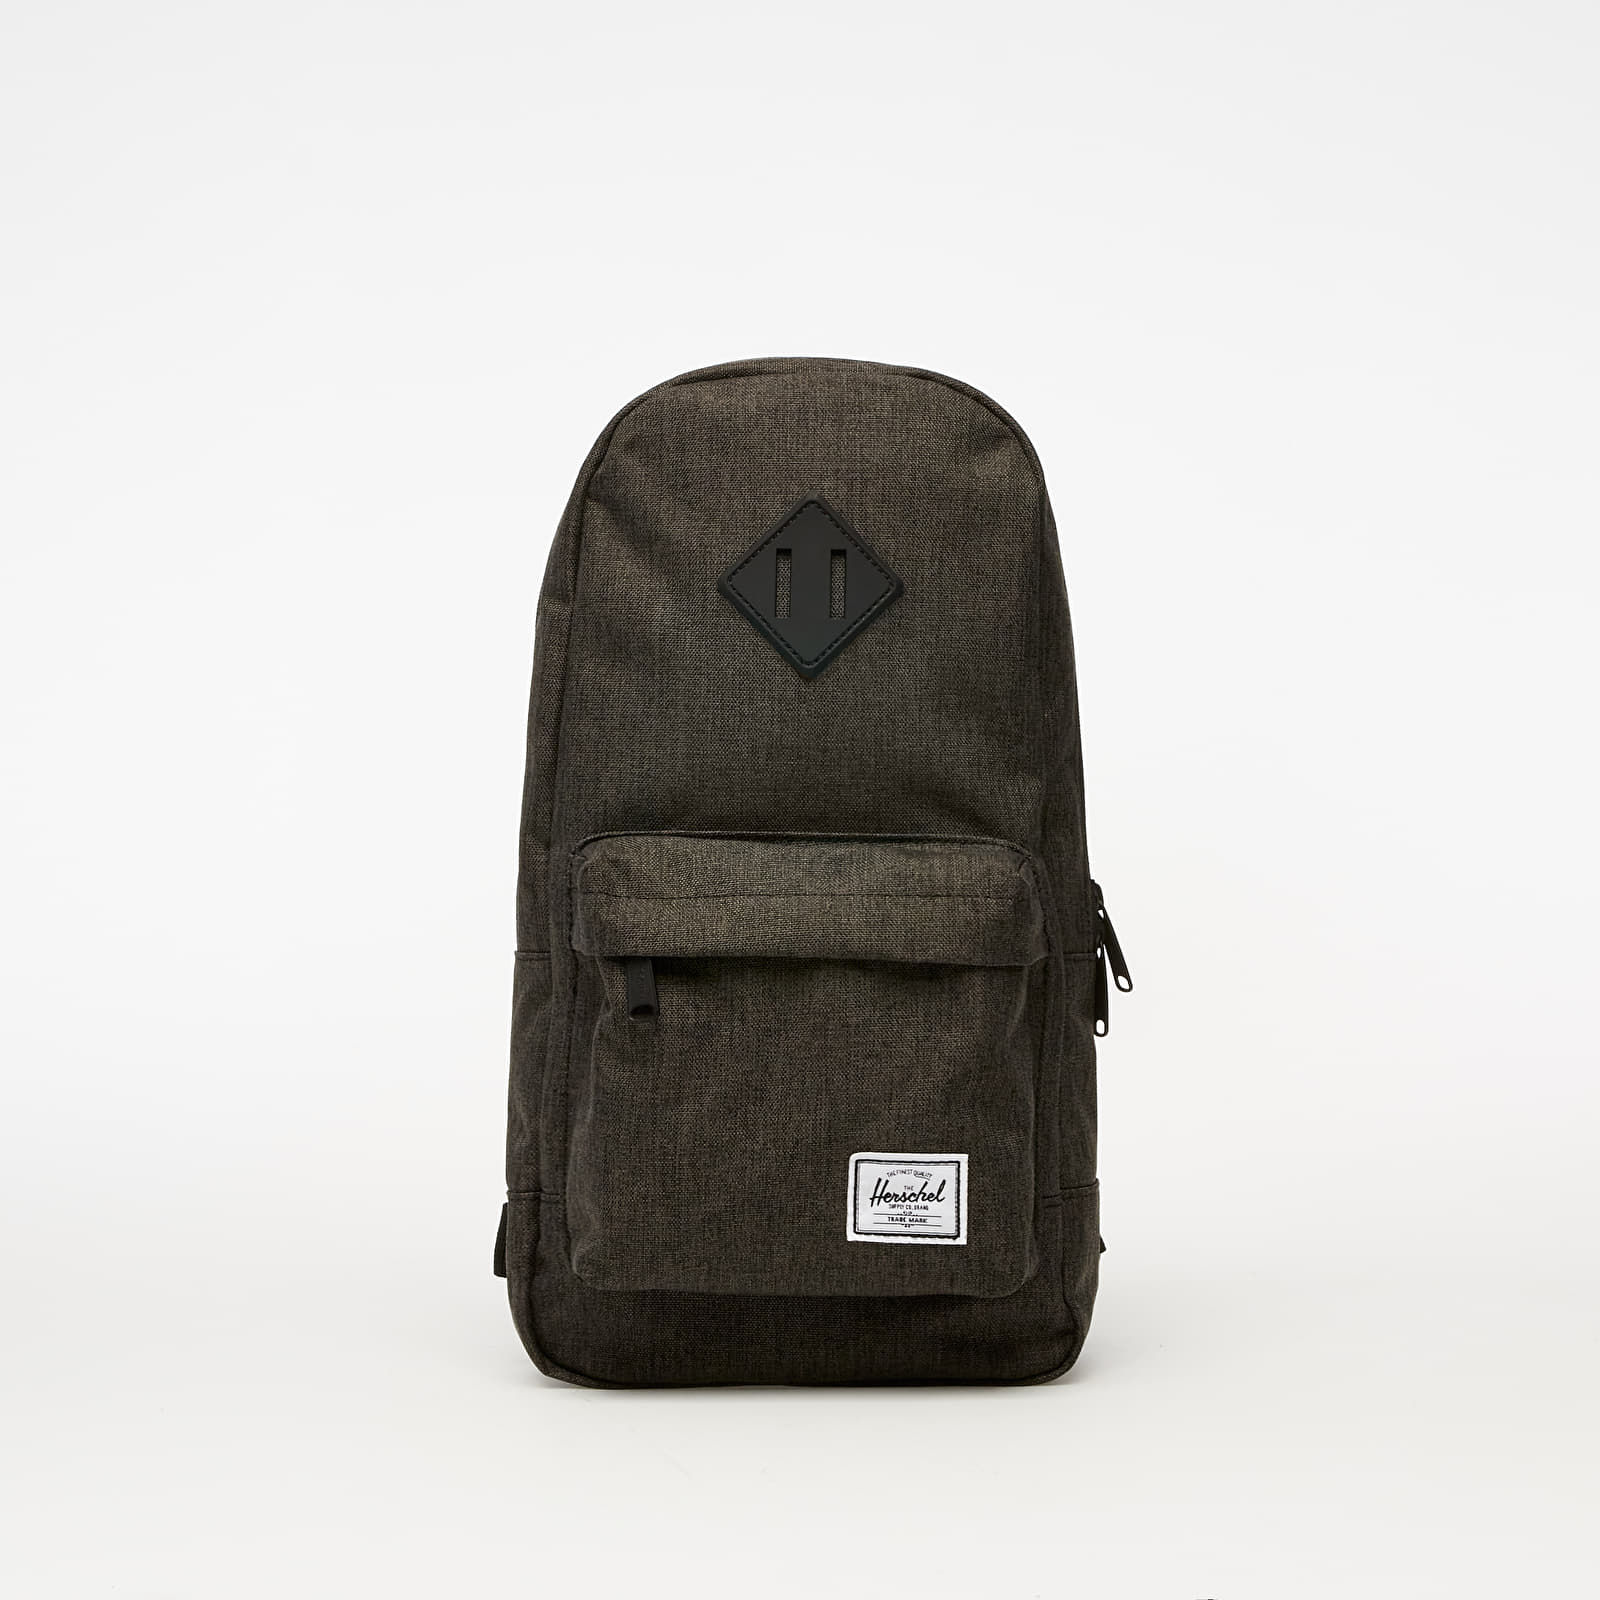 Bags Herschel Supply Co. Heritage Shoulder Bag Black Crosshatch